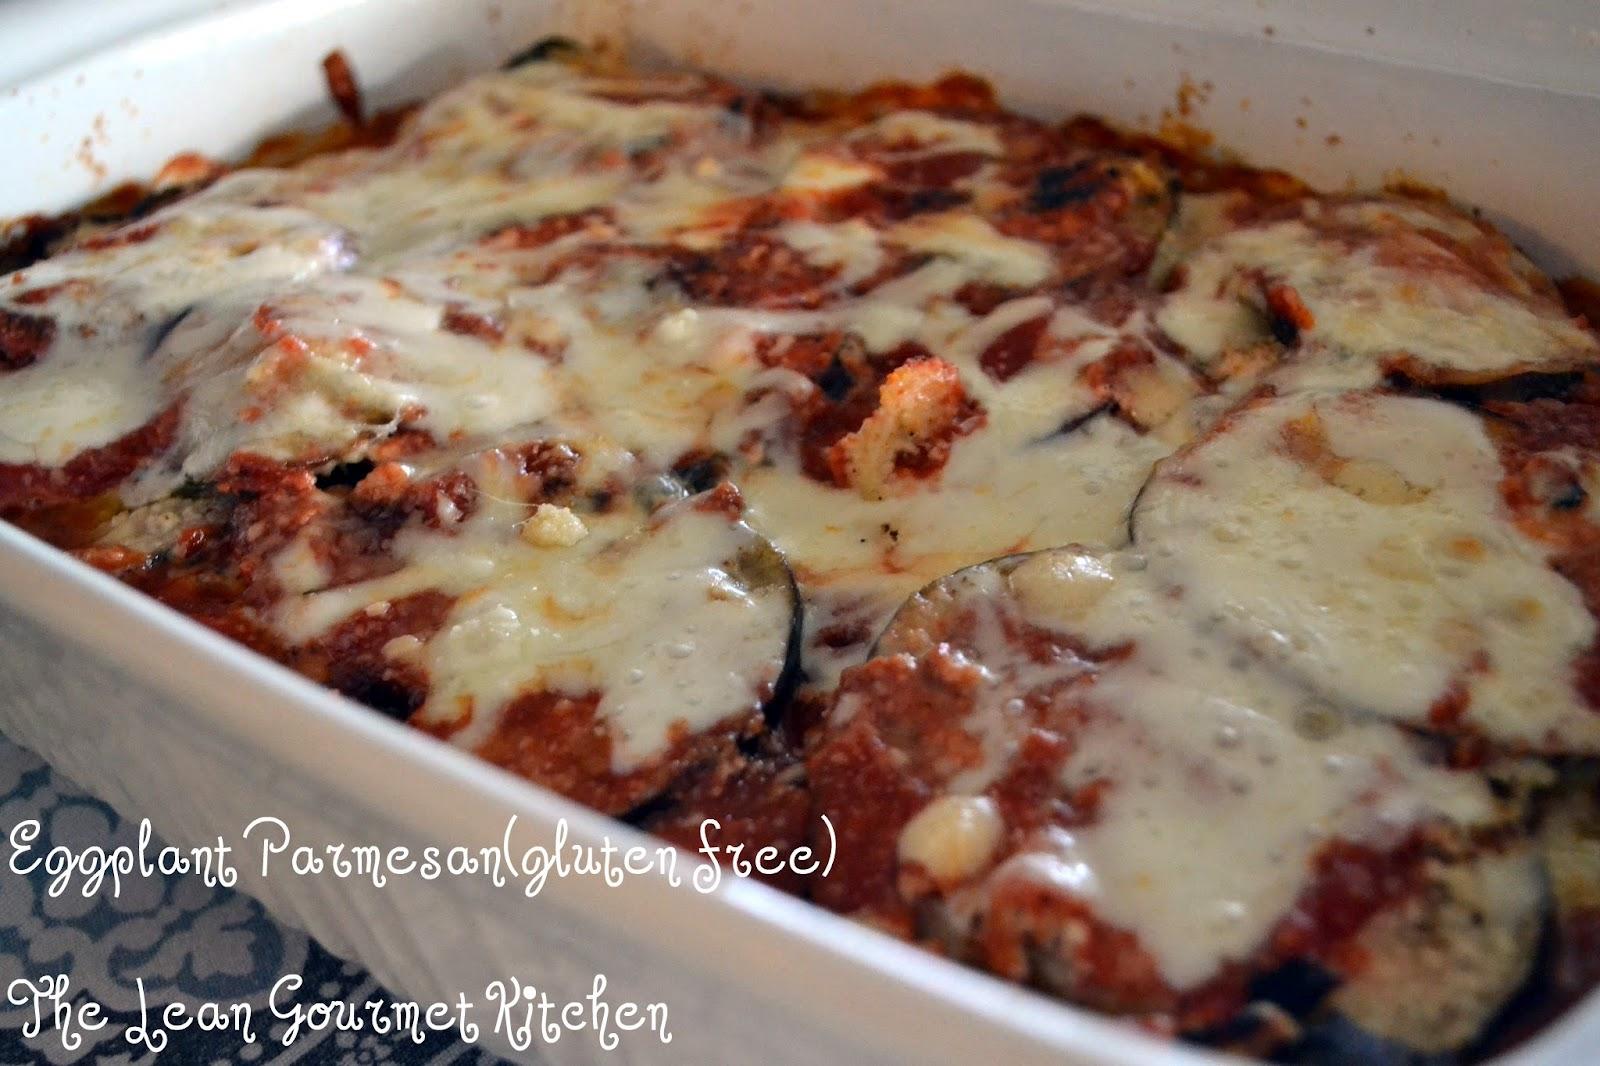 The Lean Gourmet Kitchen: Eggplant Parmesan (gluten free)